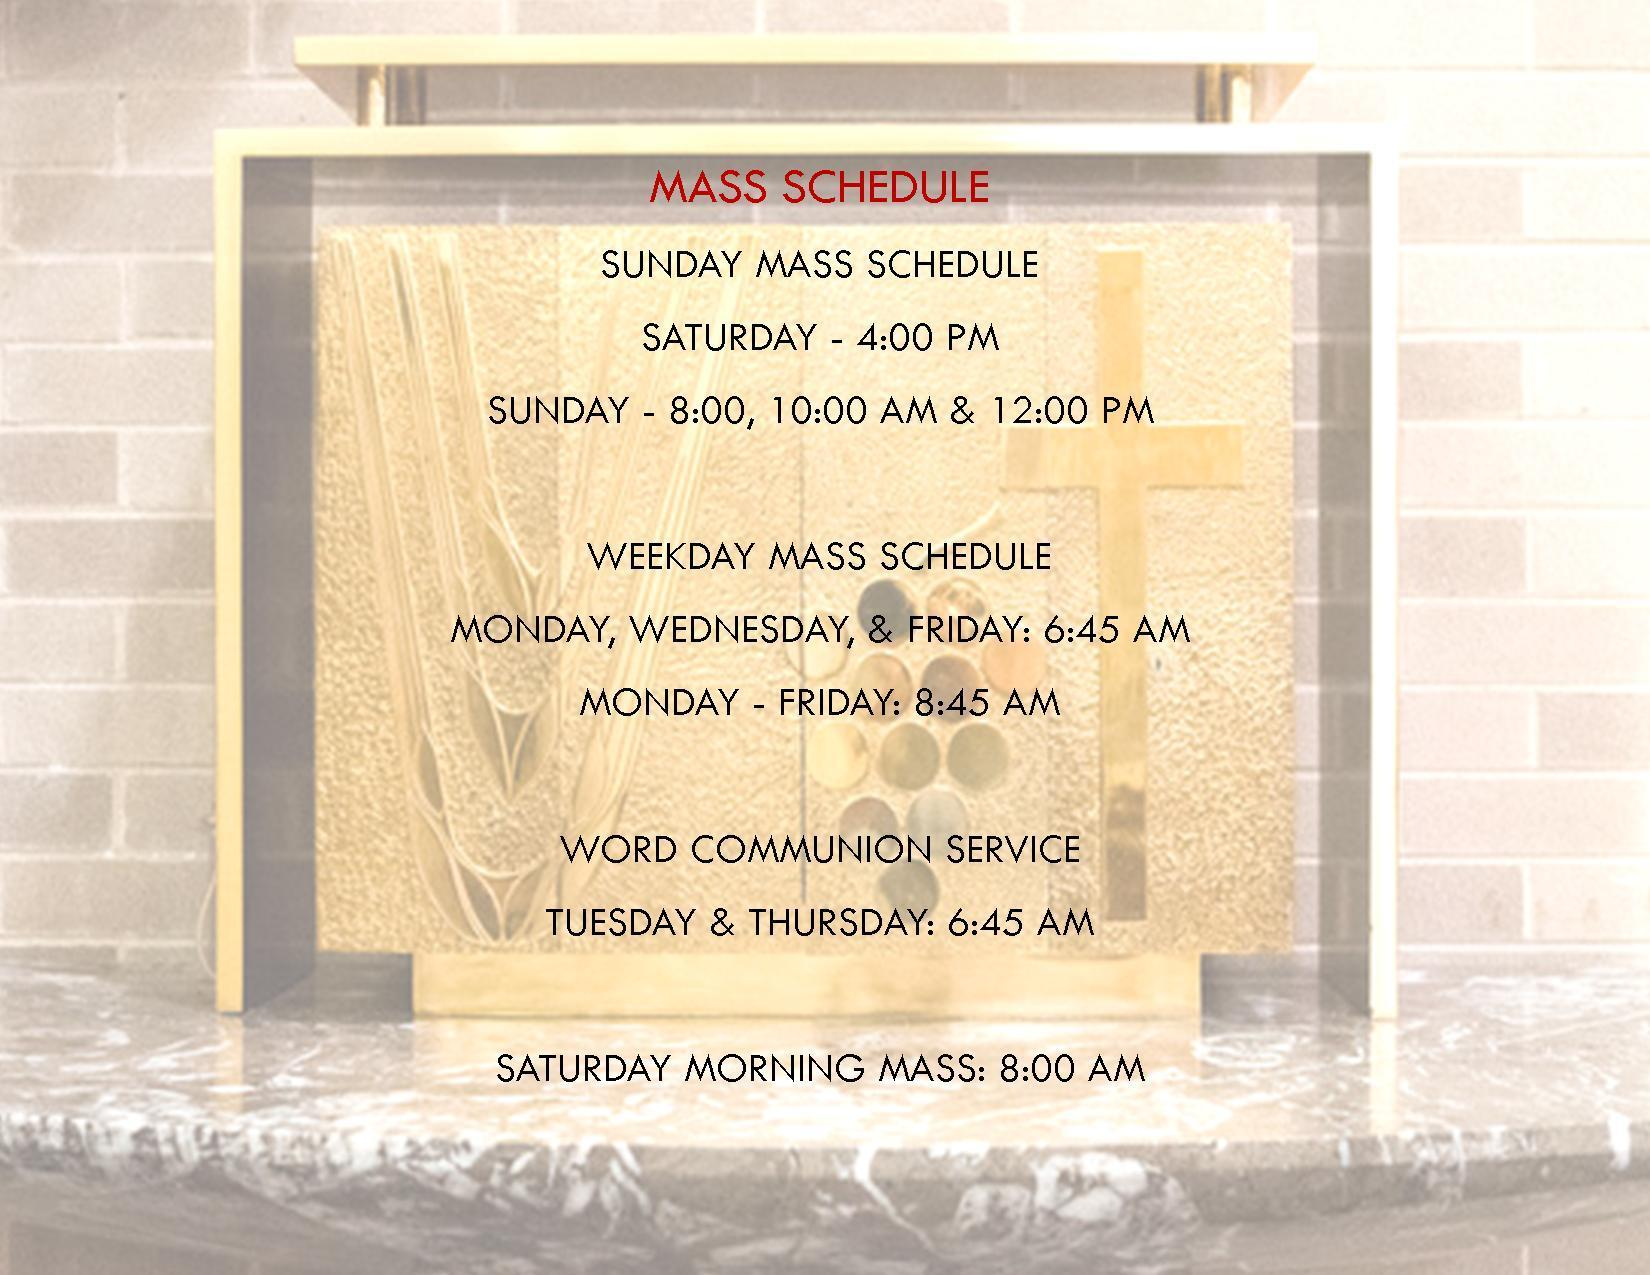 Mass Schedule Image